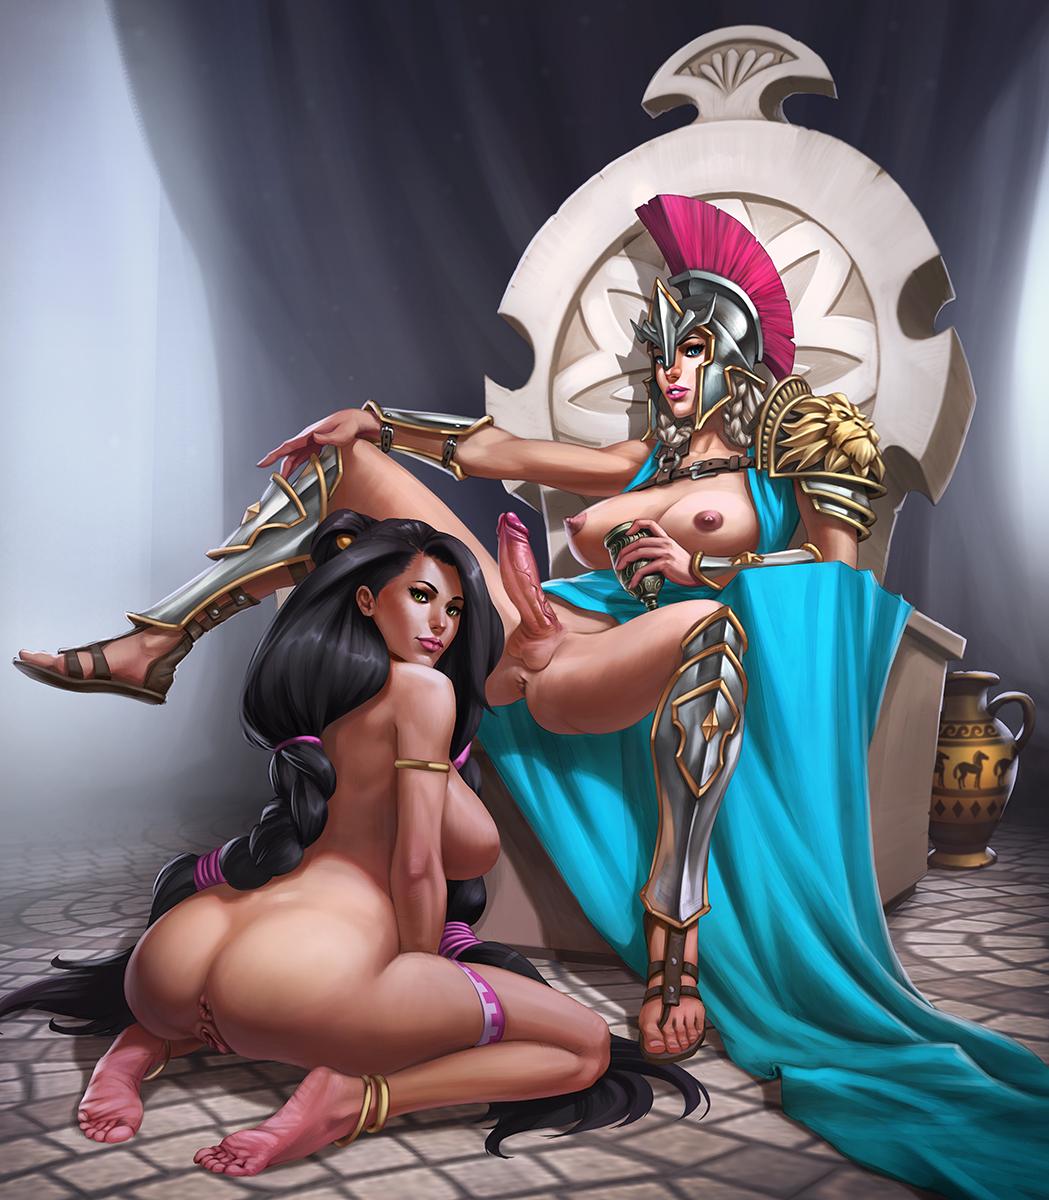 opala farah queen of legend Dead or alive 5 christie